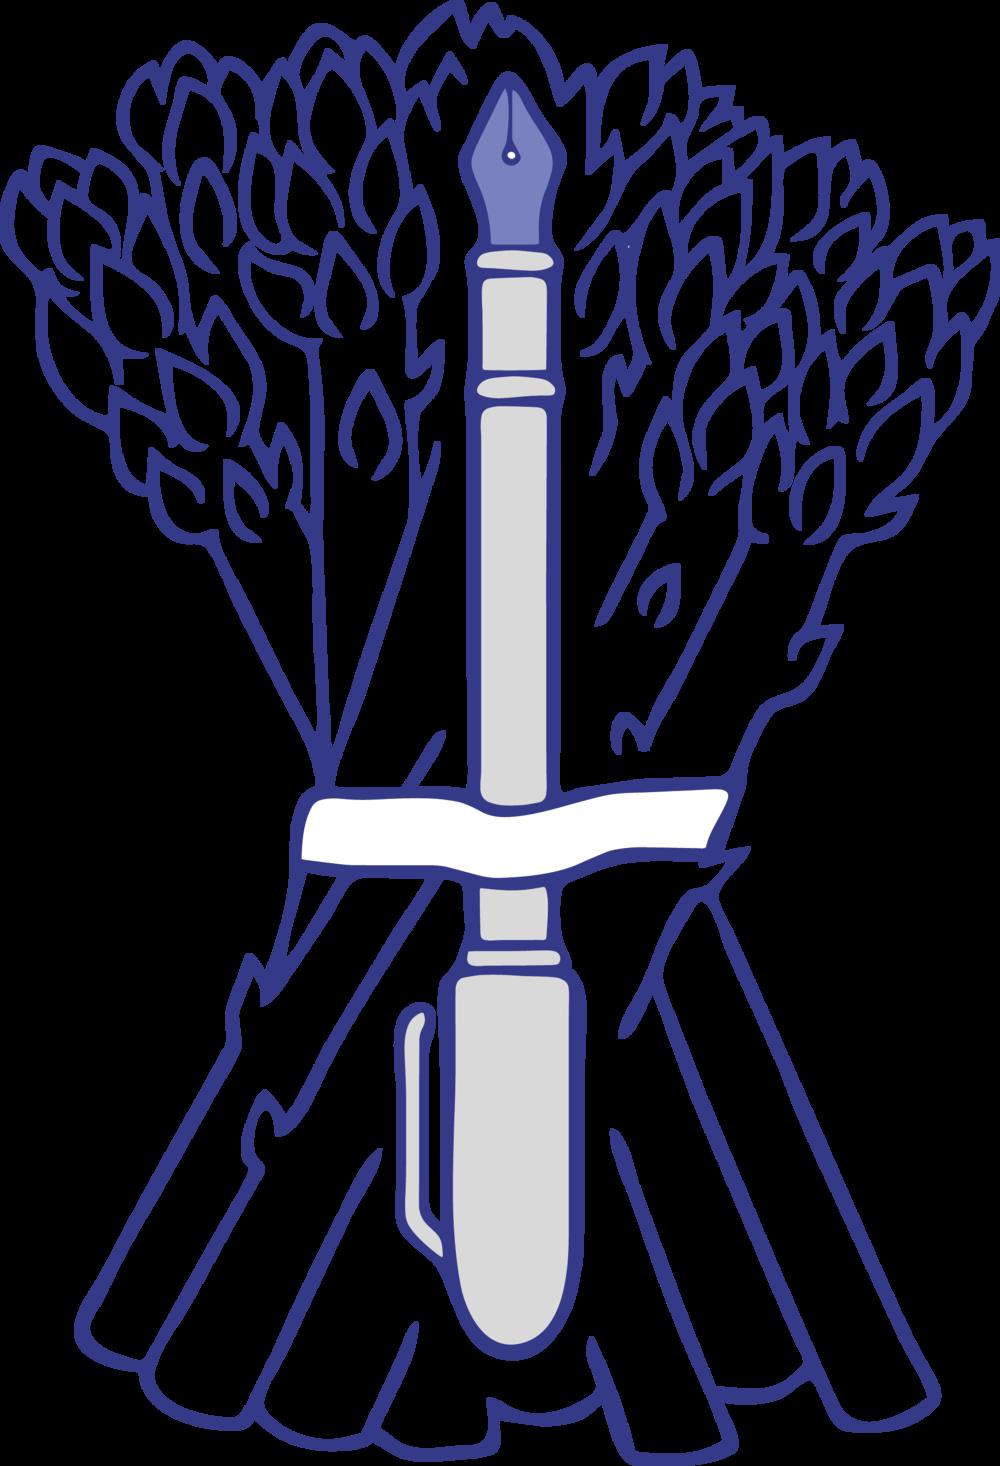 LWaverman_Logo_UpdateHR.png